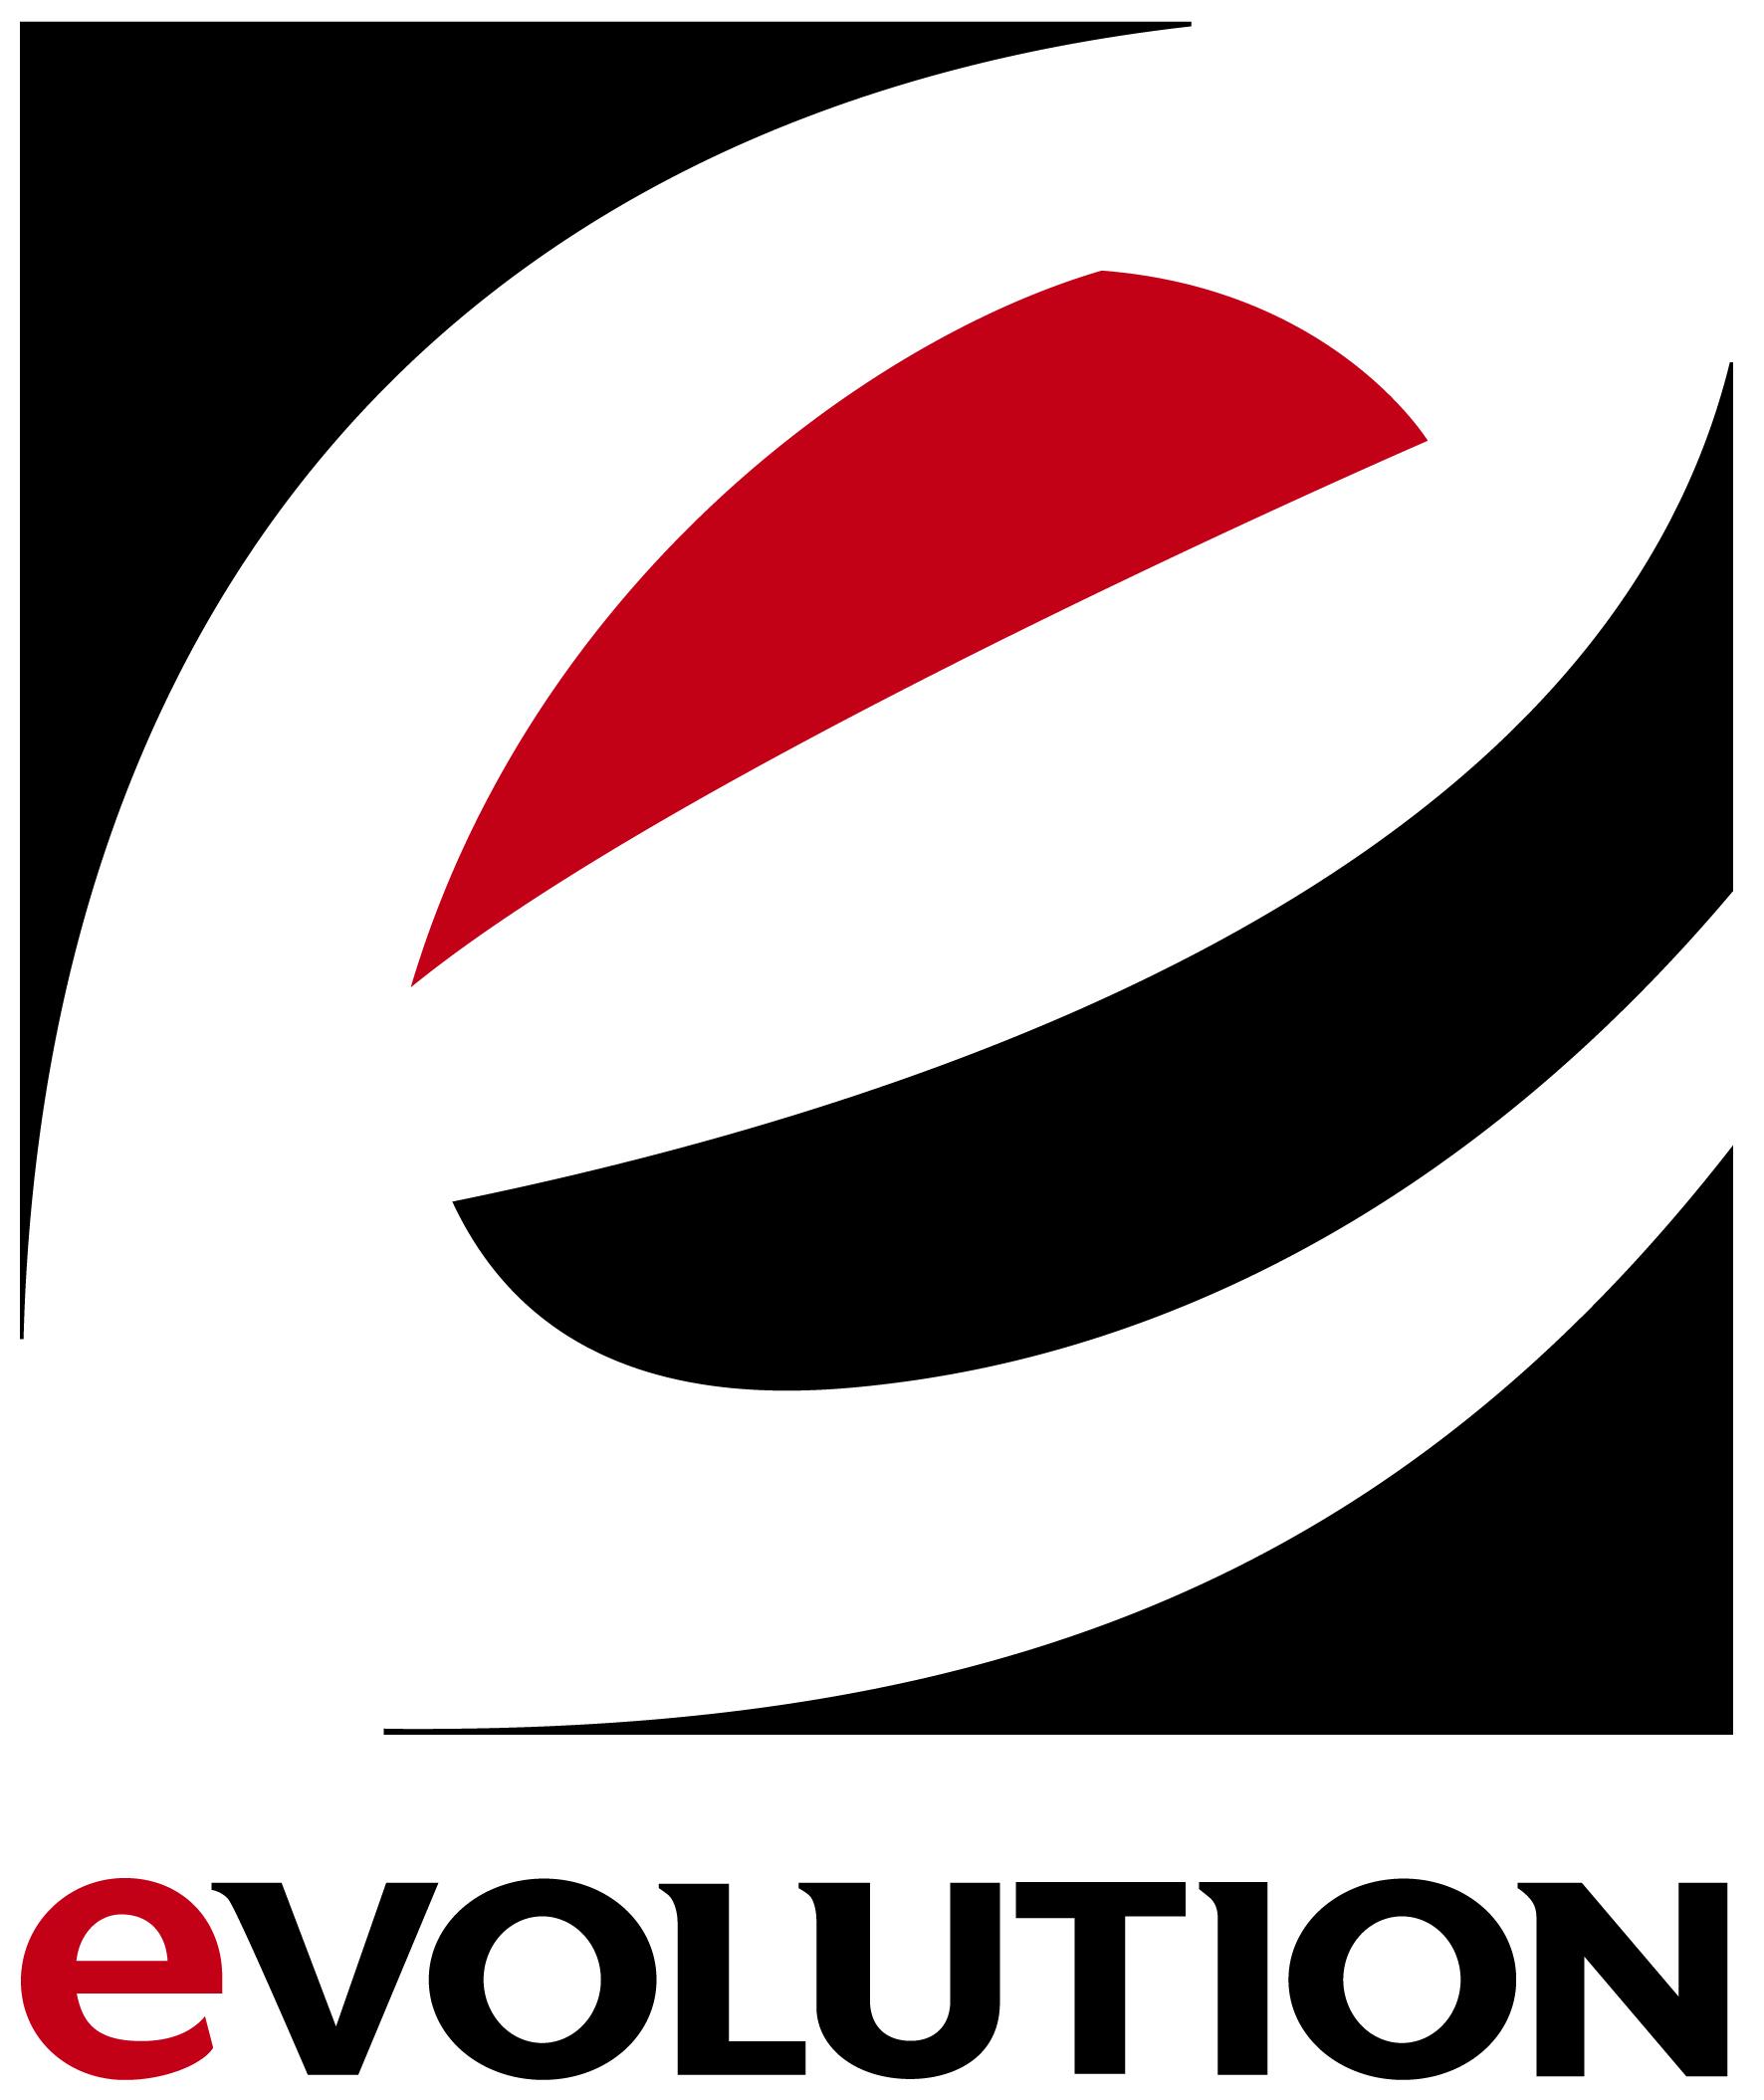 evolution sails - with Logotype.jpg